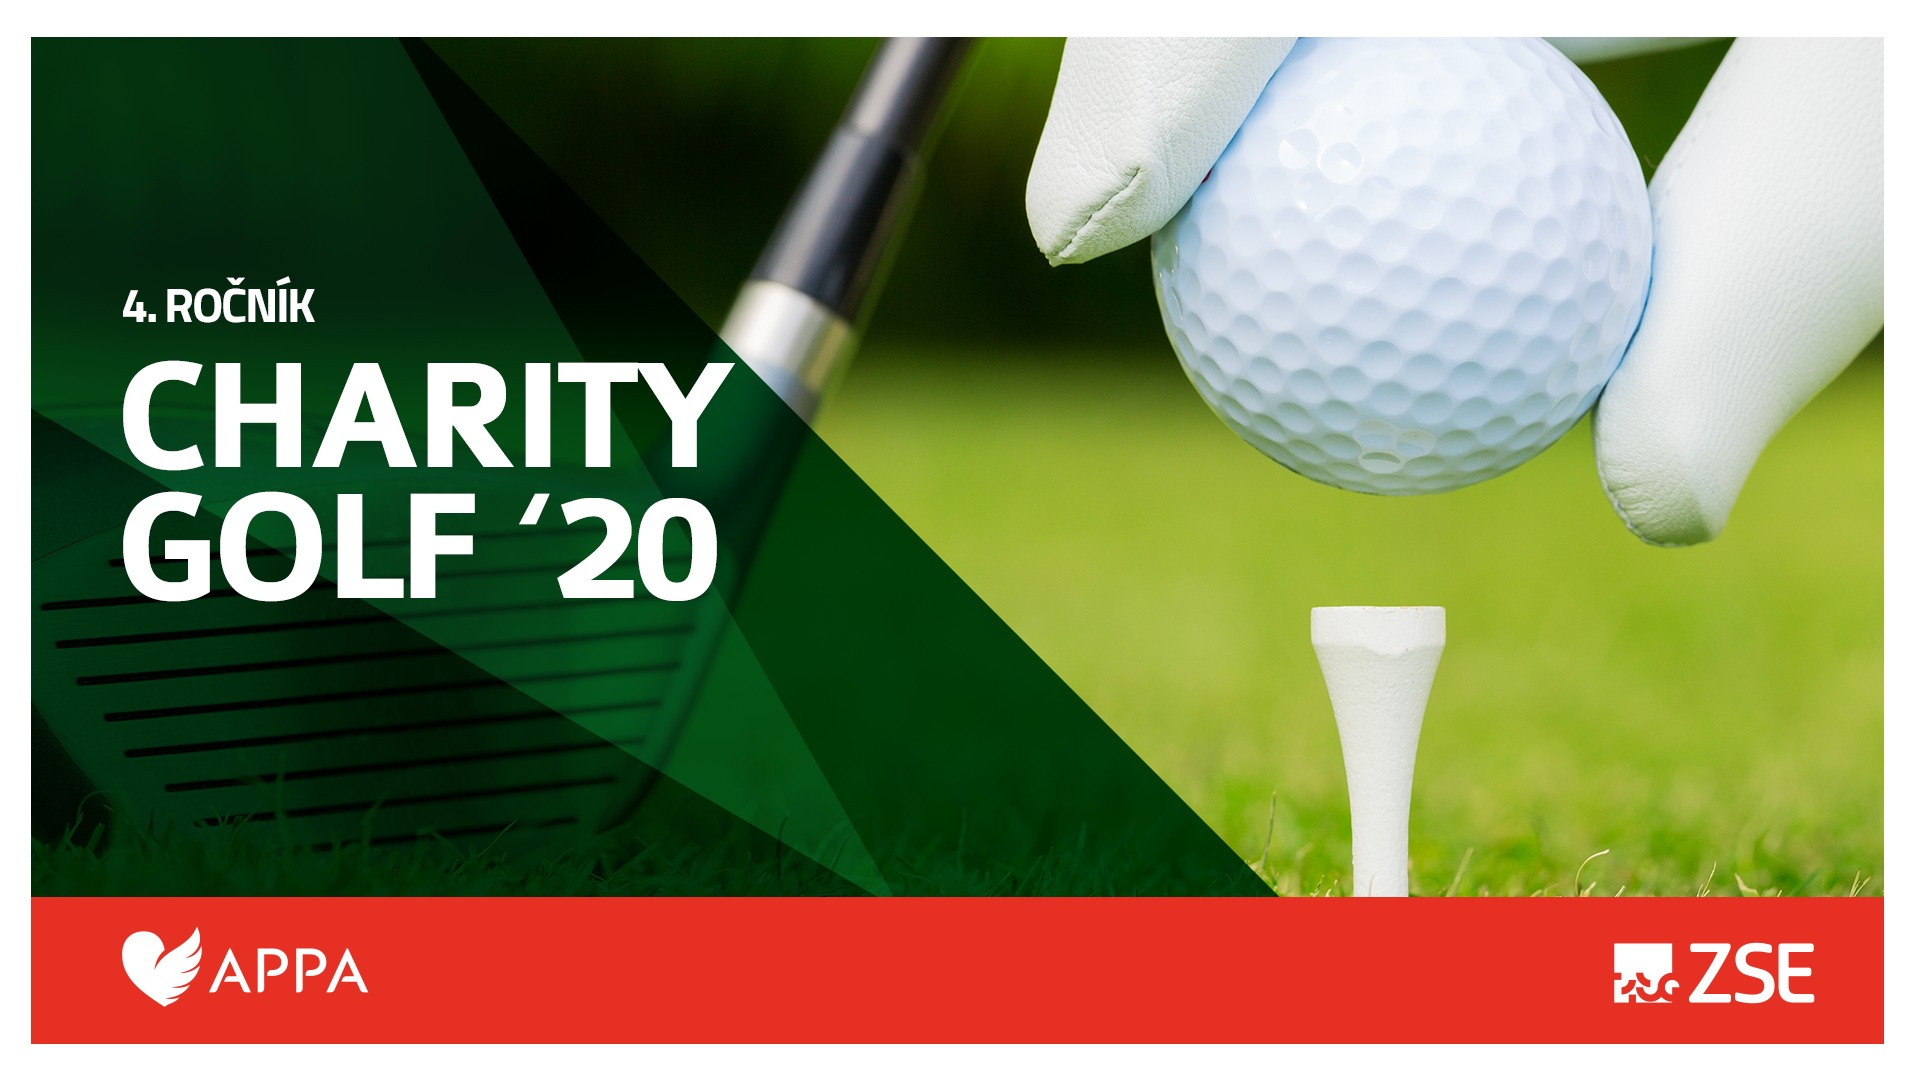 Charity Golf '20